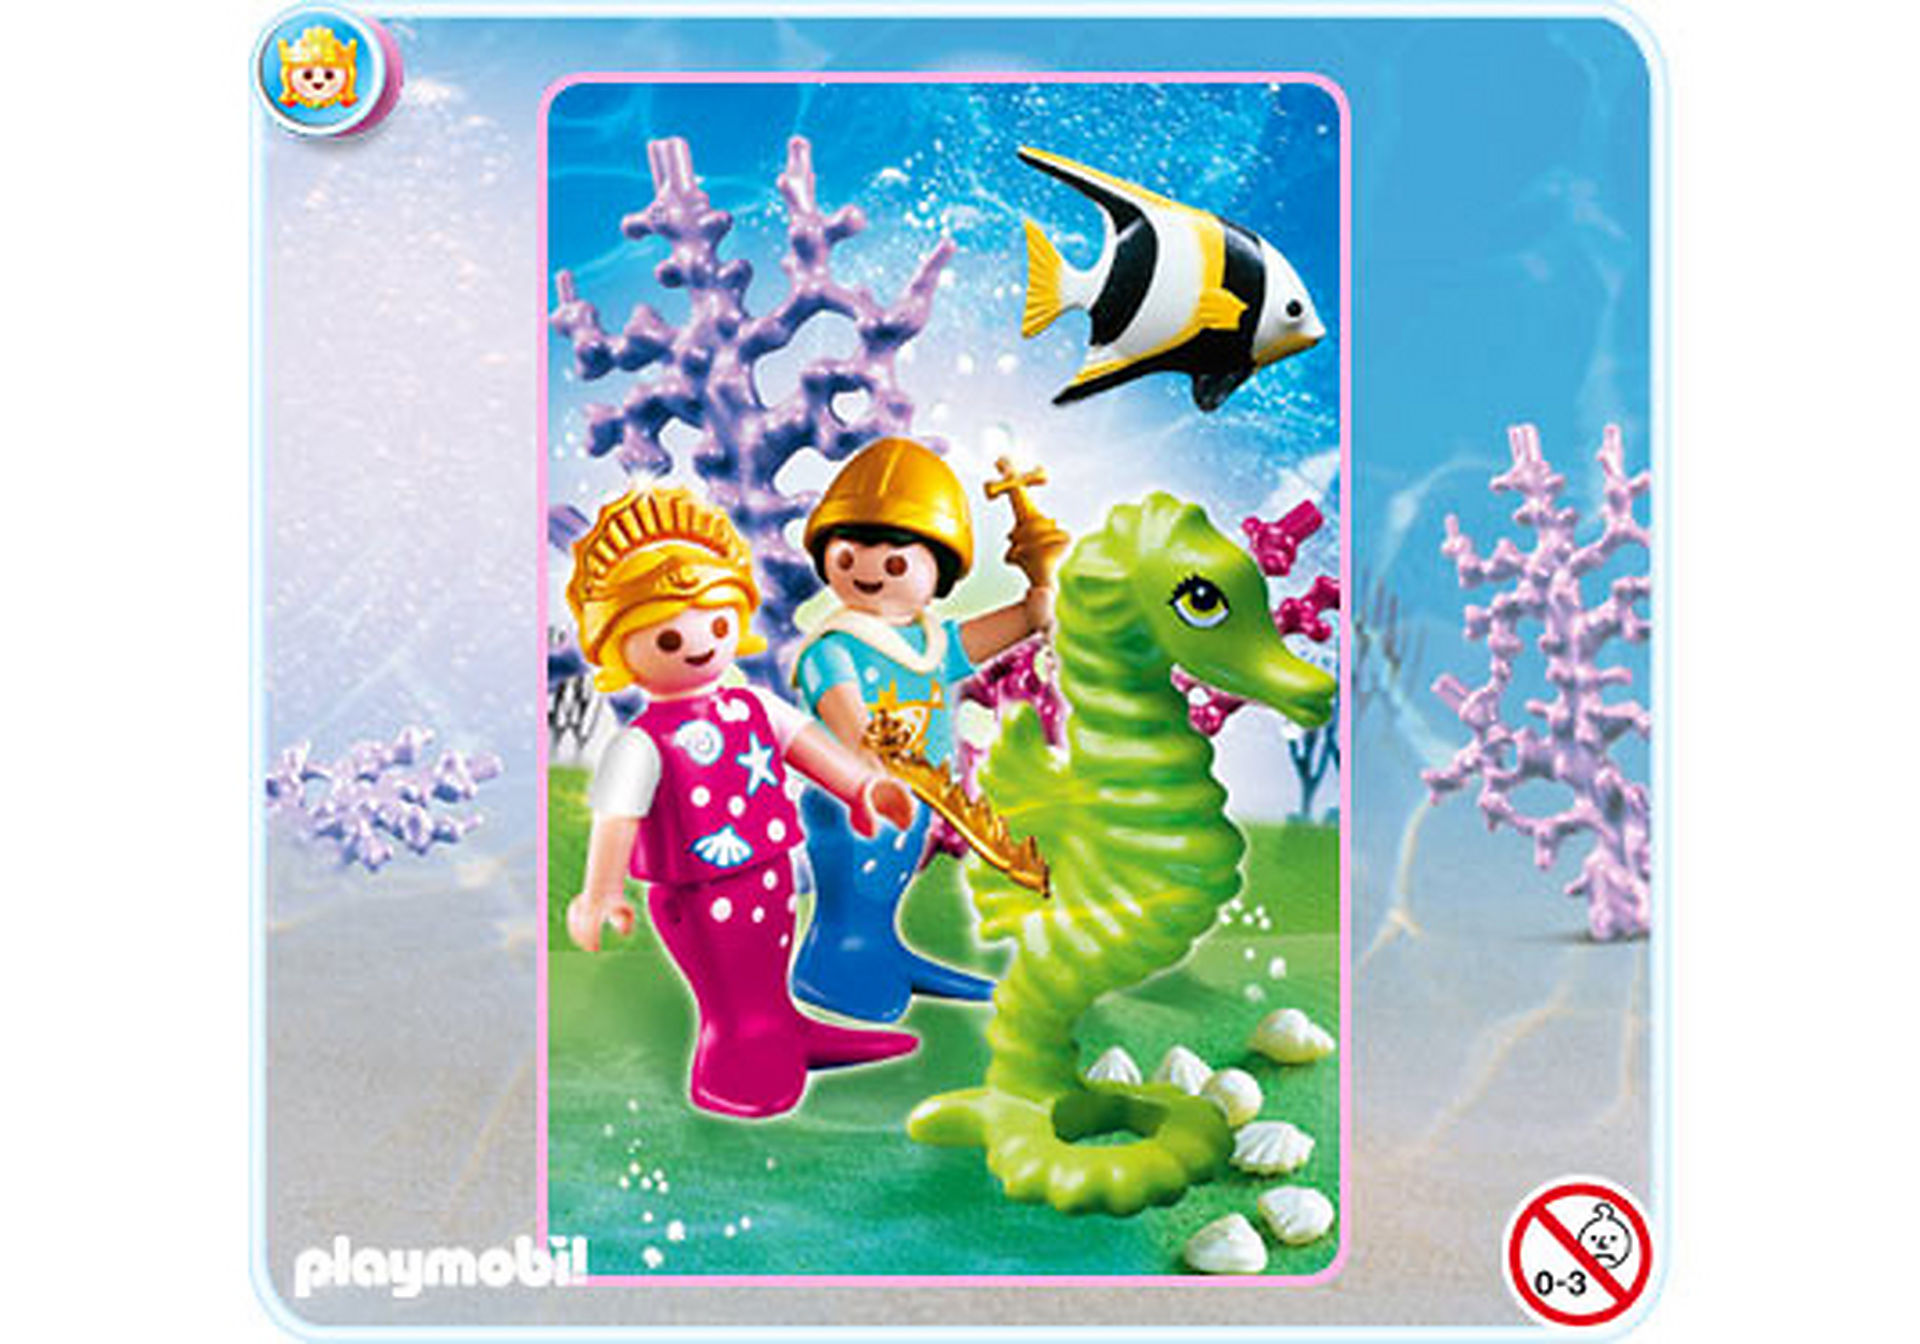 http://media.playmobil.com/i/playmobil/4814-A_product_detail/Kleine Nixe und Prinz